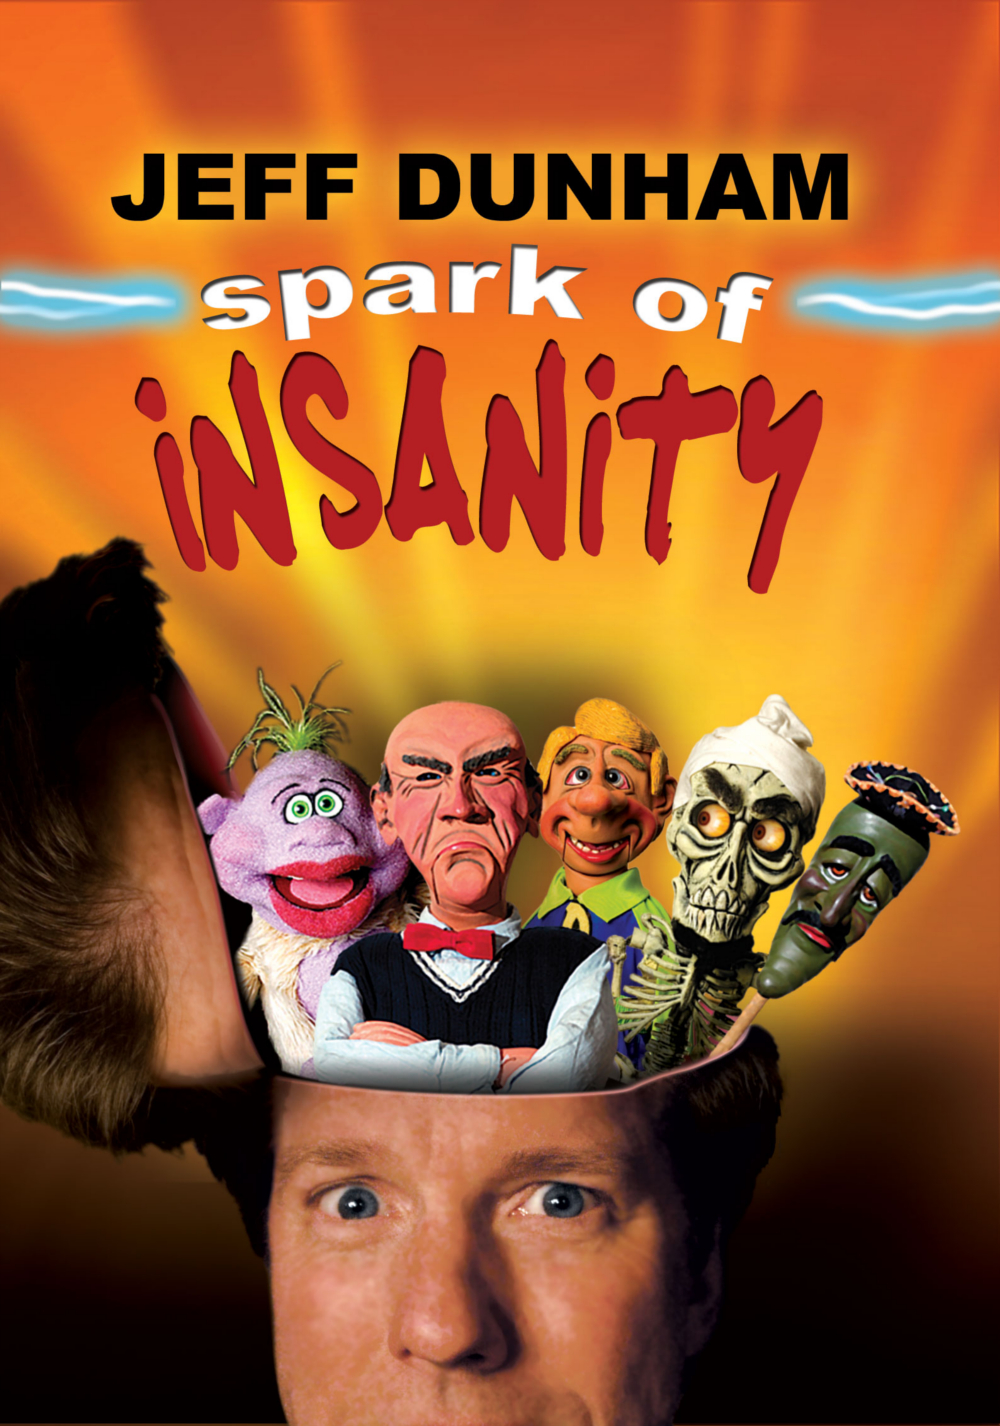 jeff dunham  spark of insanity